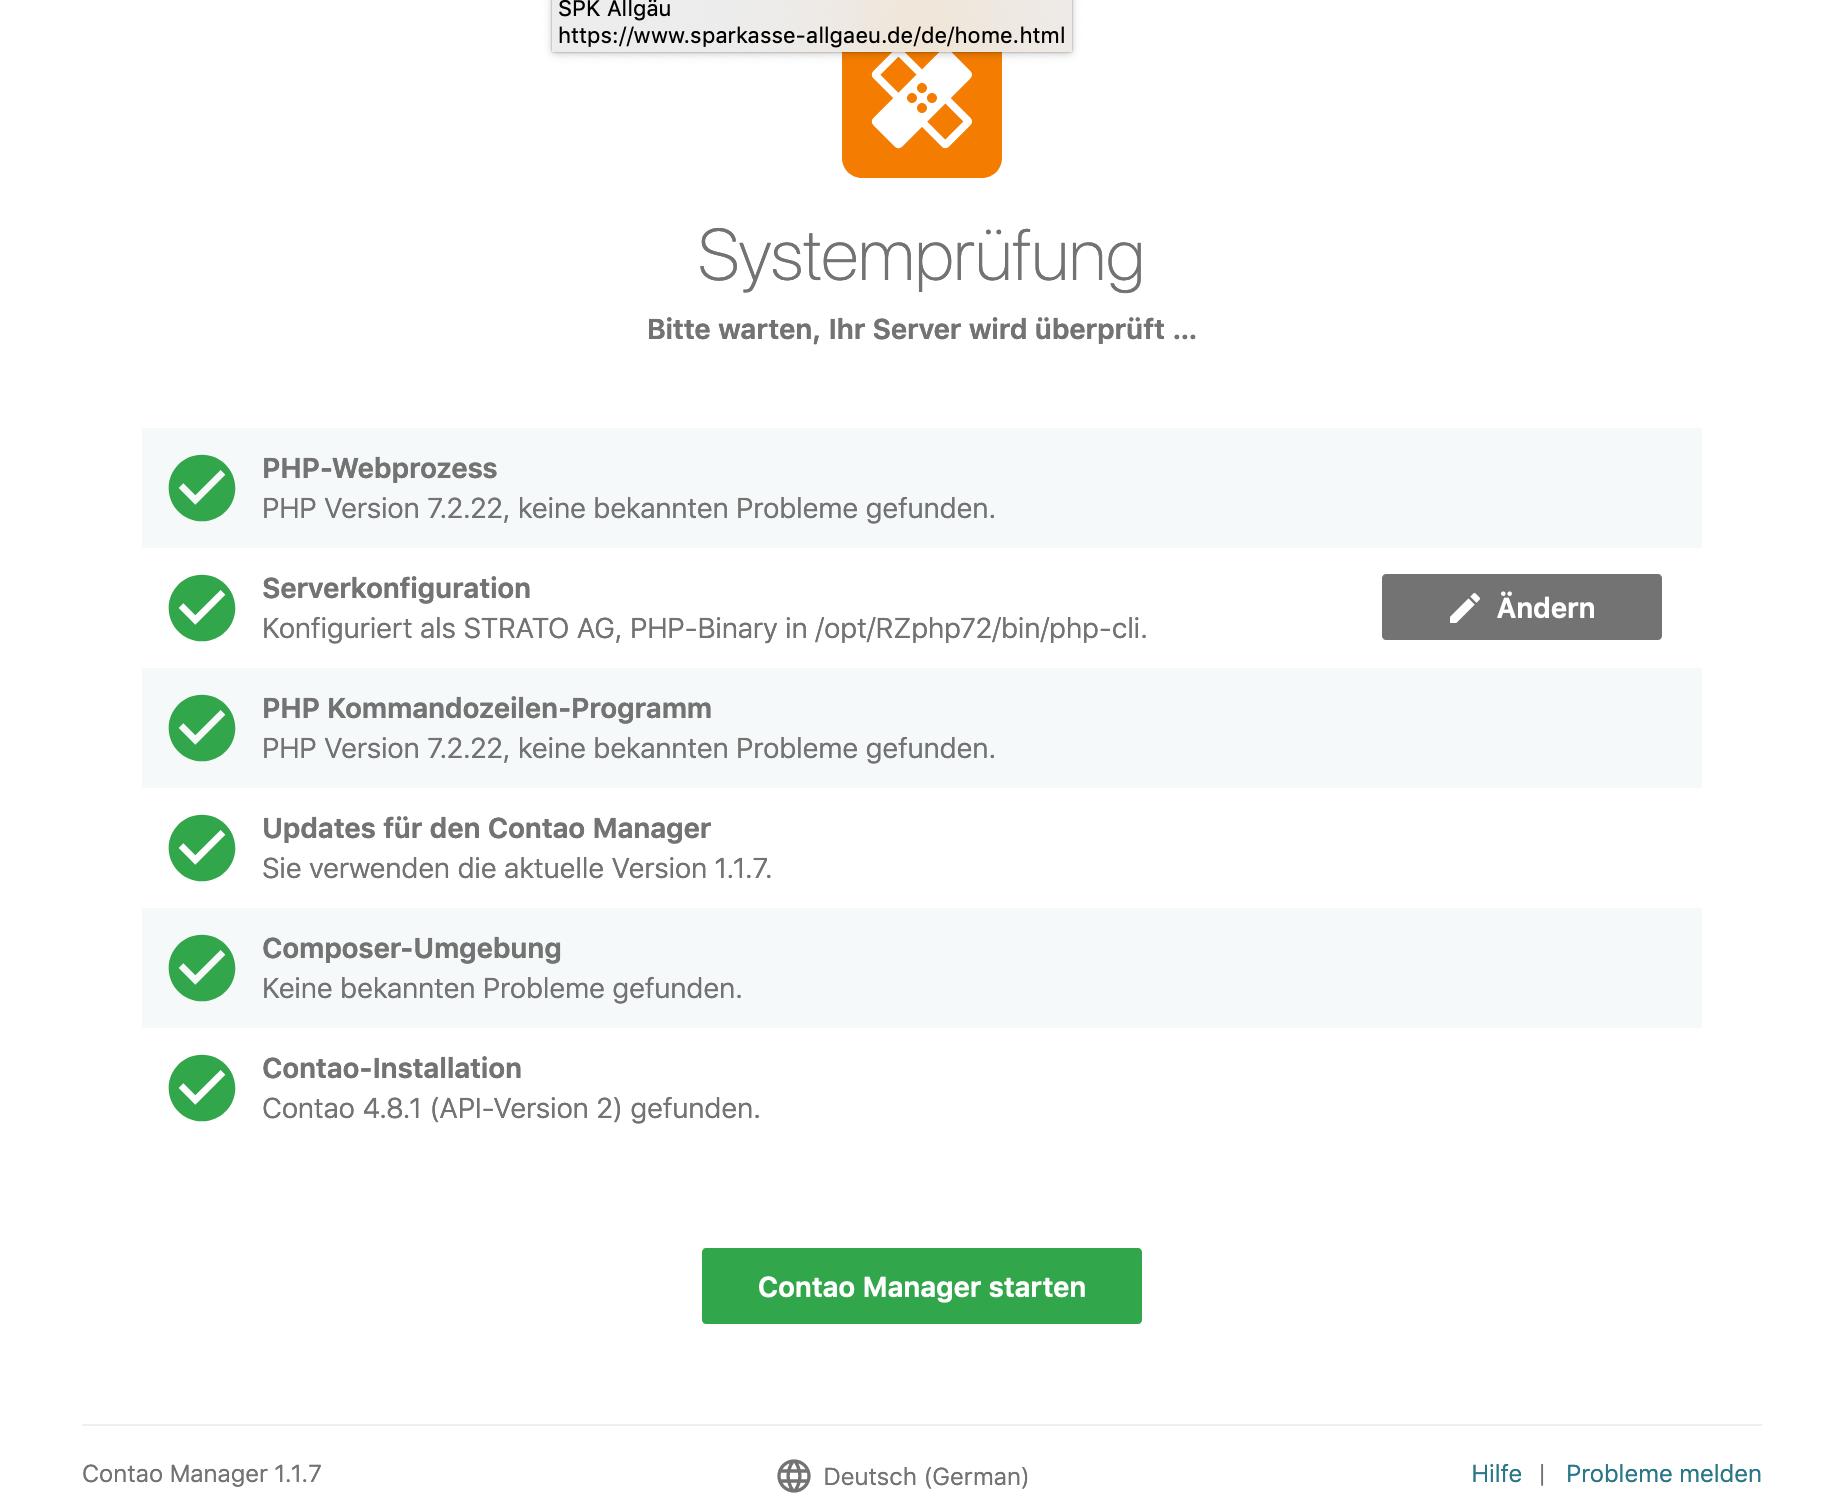 Systemprüfung